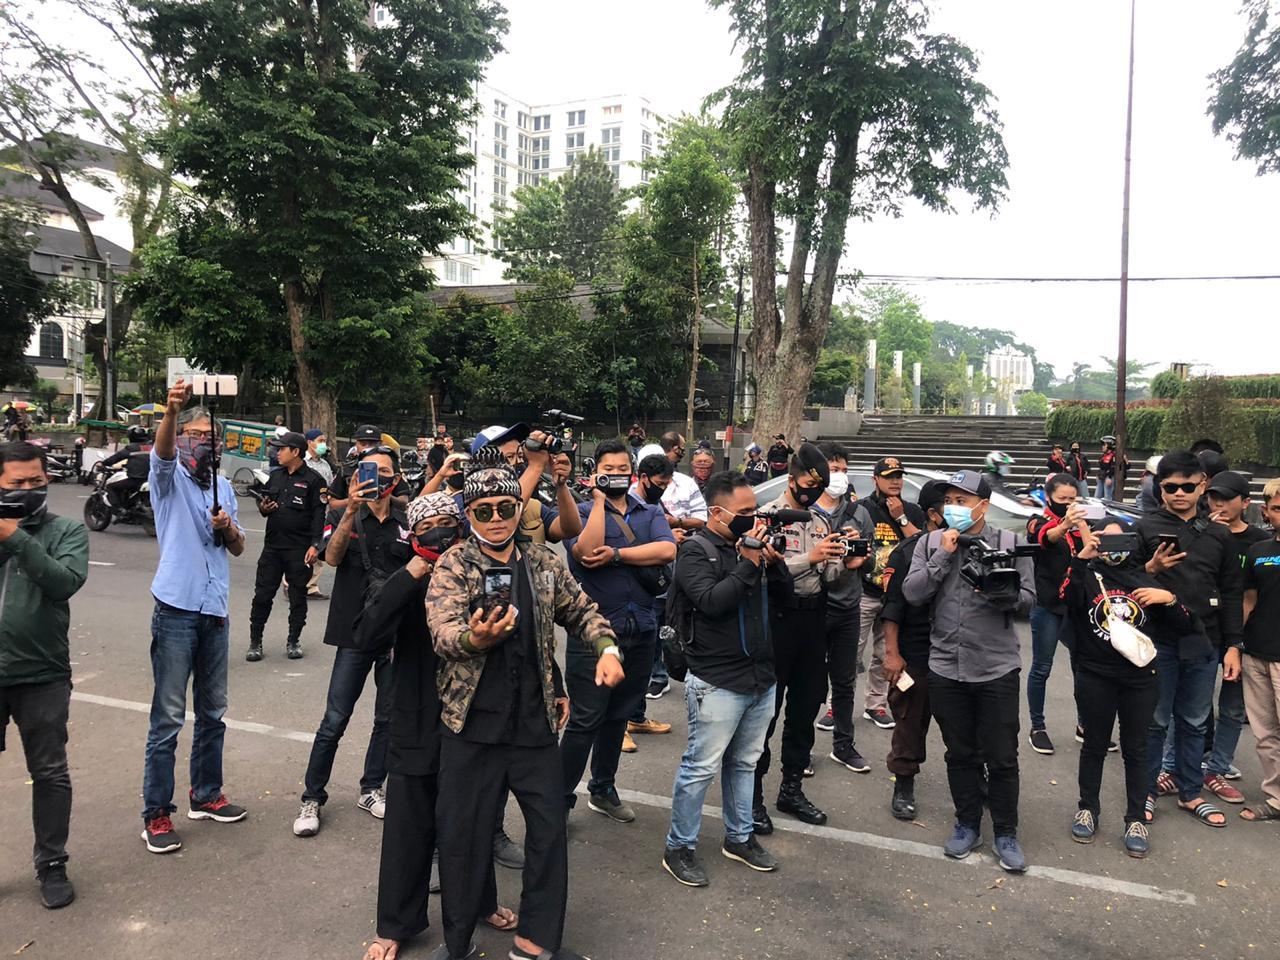 BBGB Unjuk Rasa Menolak Tindakan Anarkisme Di Kota Bandung